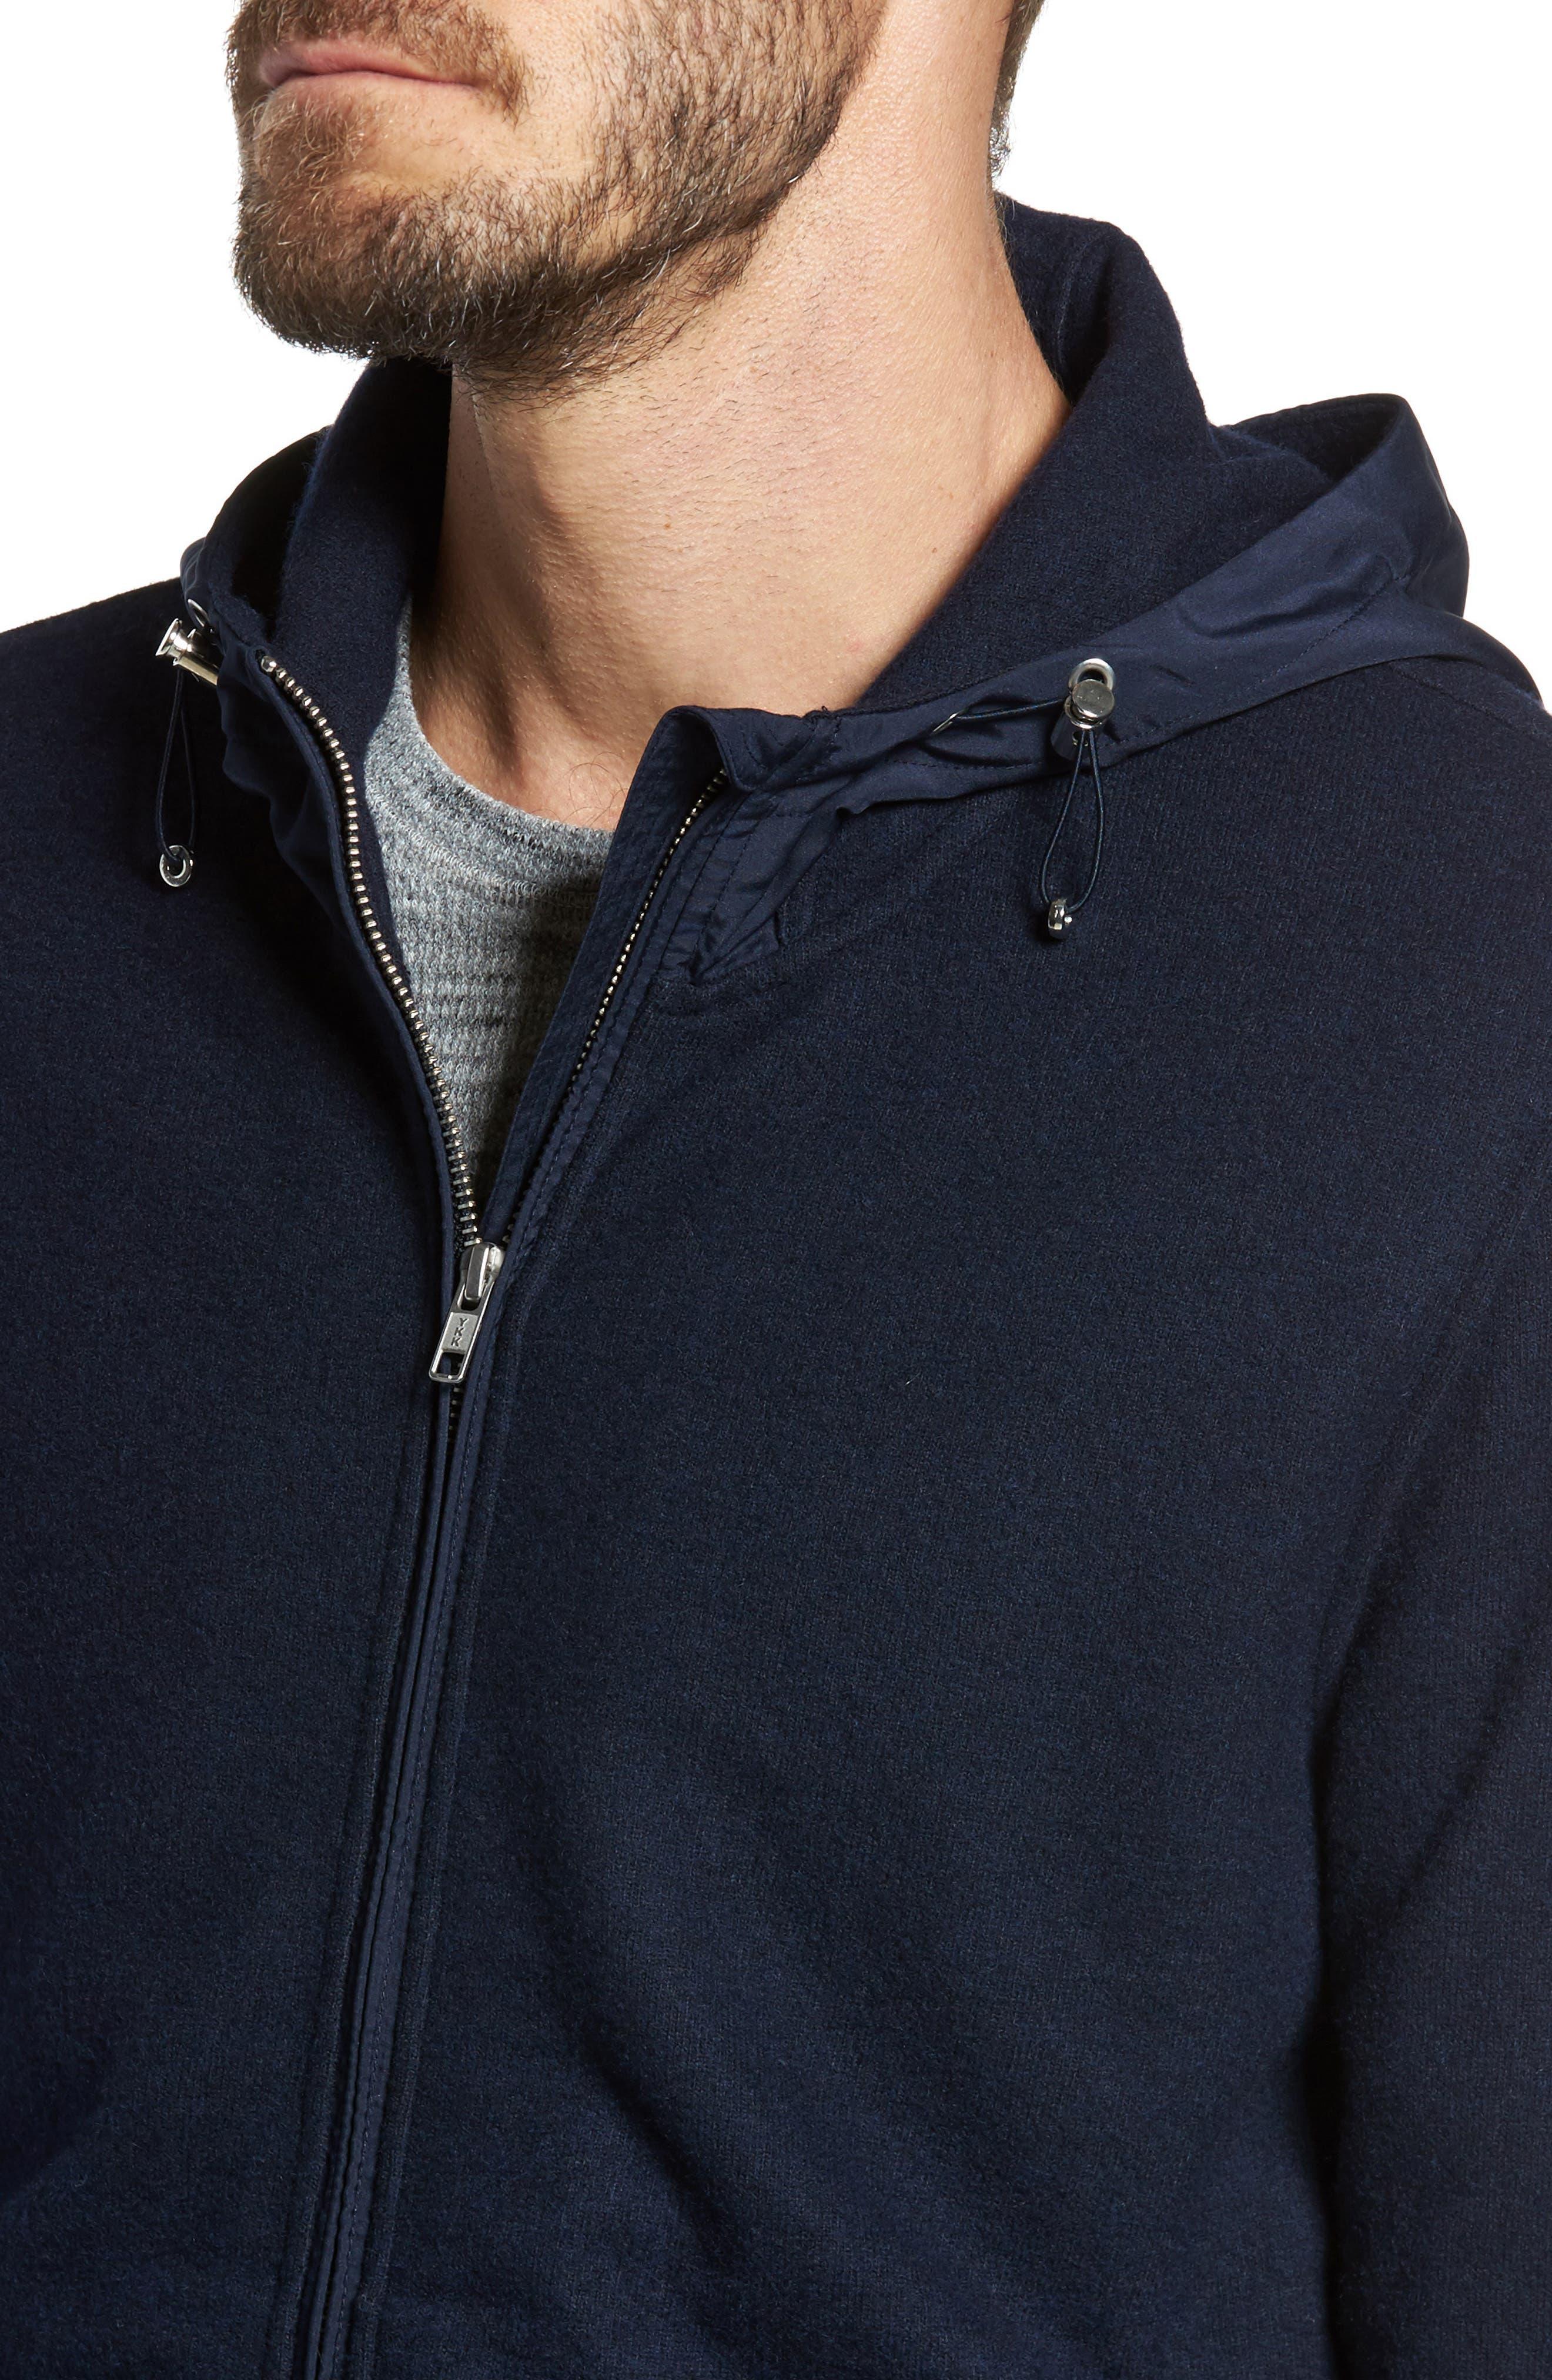 Wool Blend Hooded Cardigan,                             Alternate thumbnail 4, color,                             Navy Iris